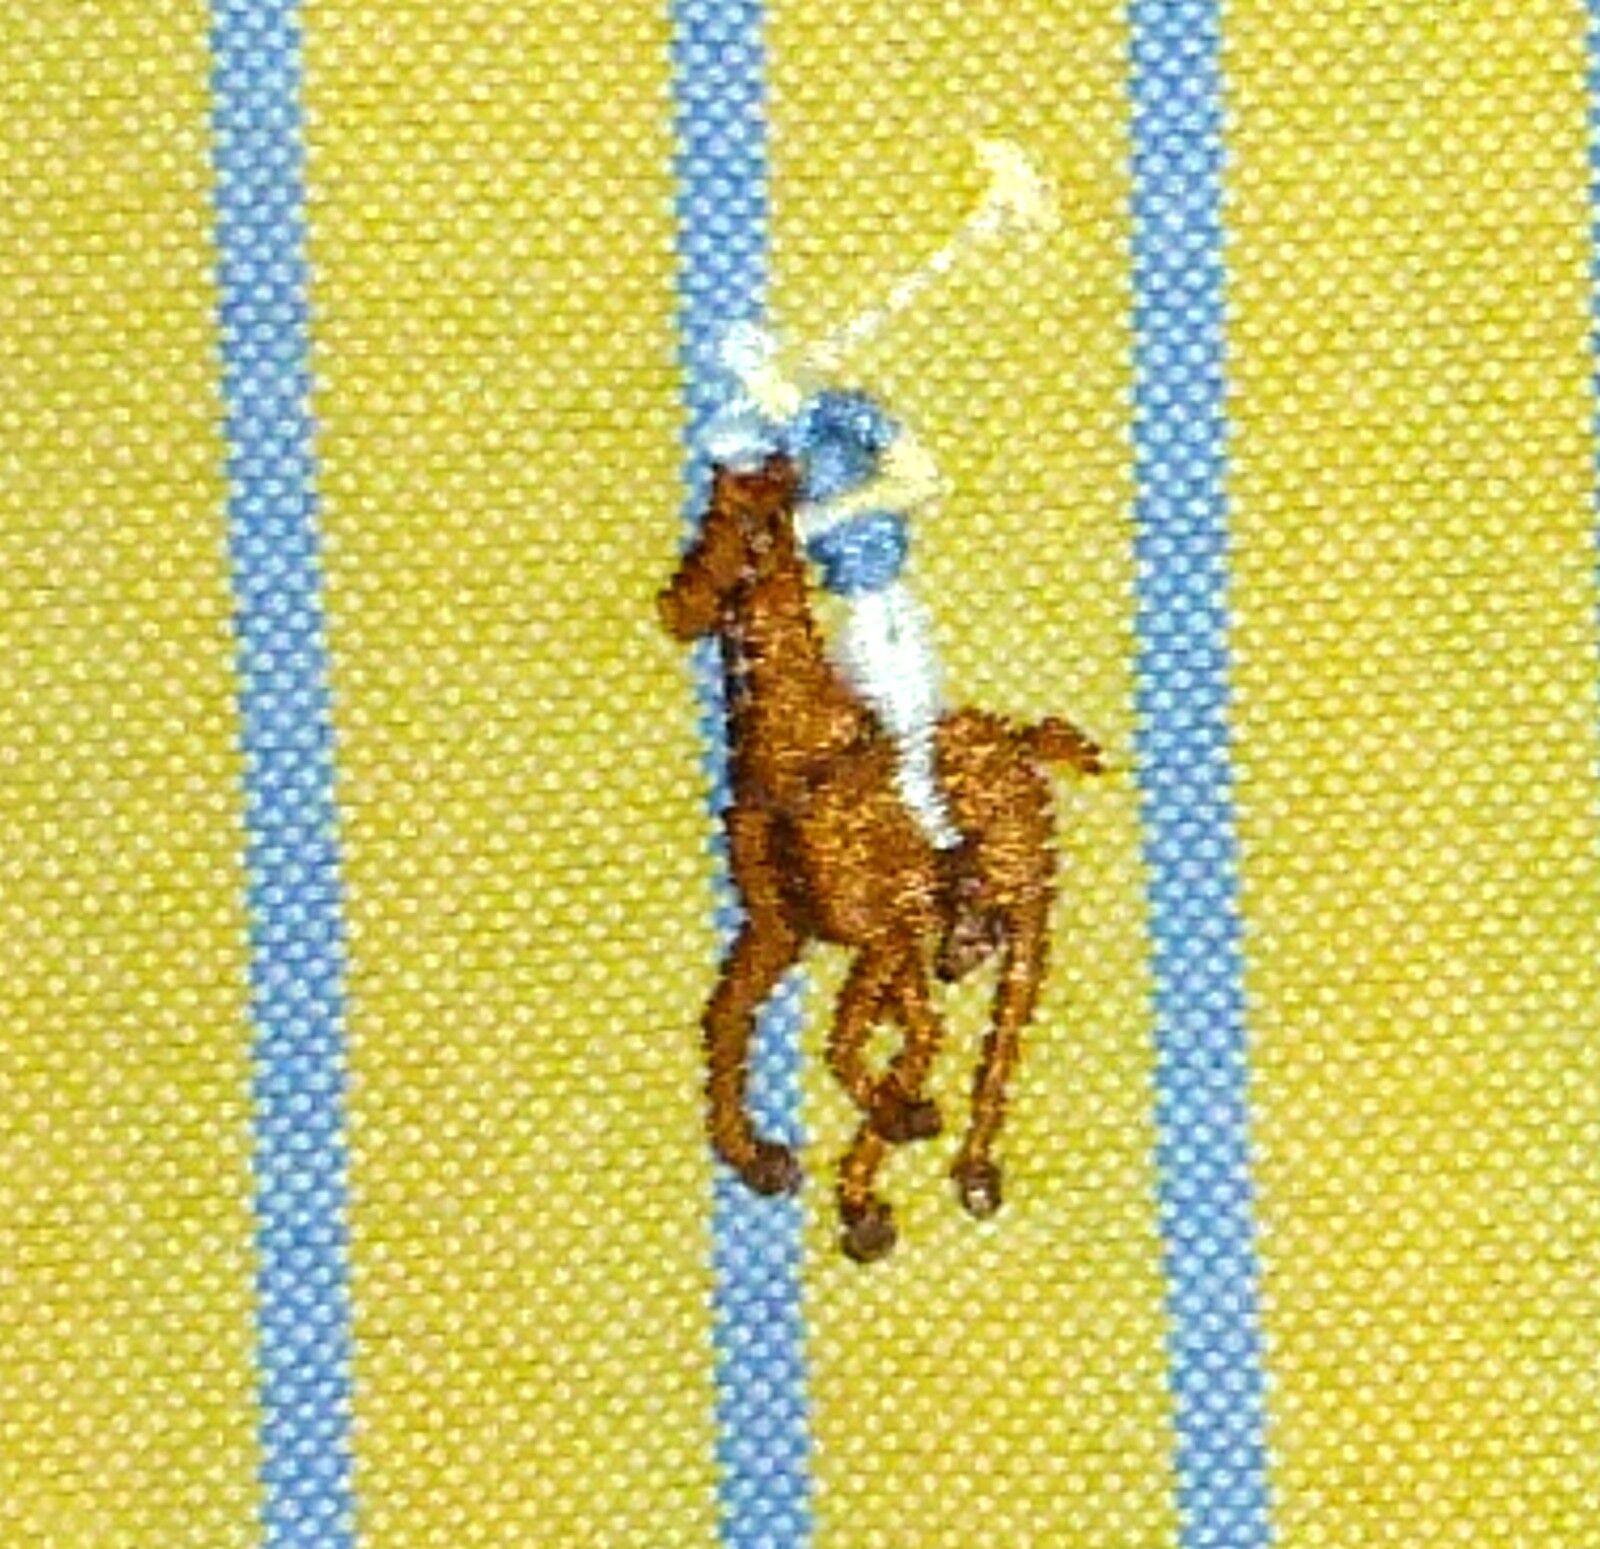 15.5 32-33 M RALPH LAUREN CLASSIC FIT TAN POLO PONY blueE YELLOW STRIPE MEN SHIRT